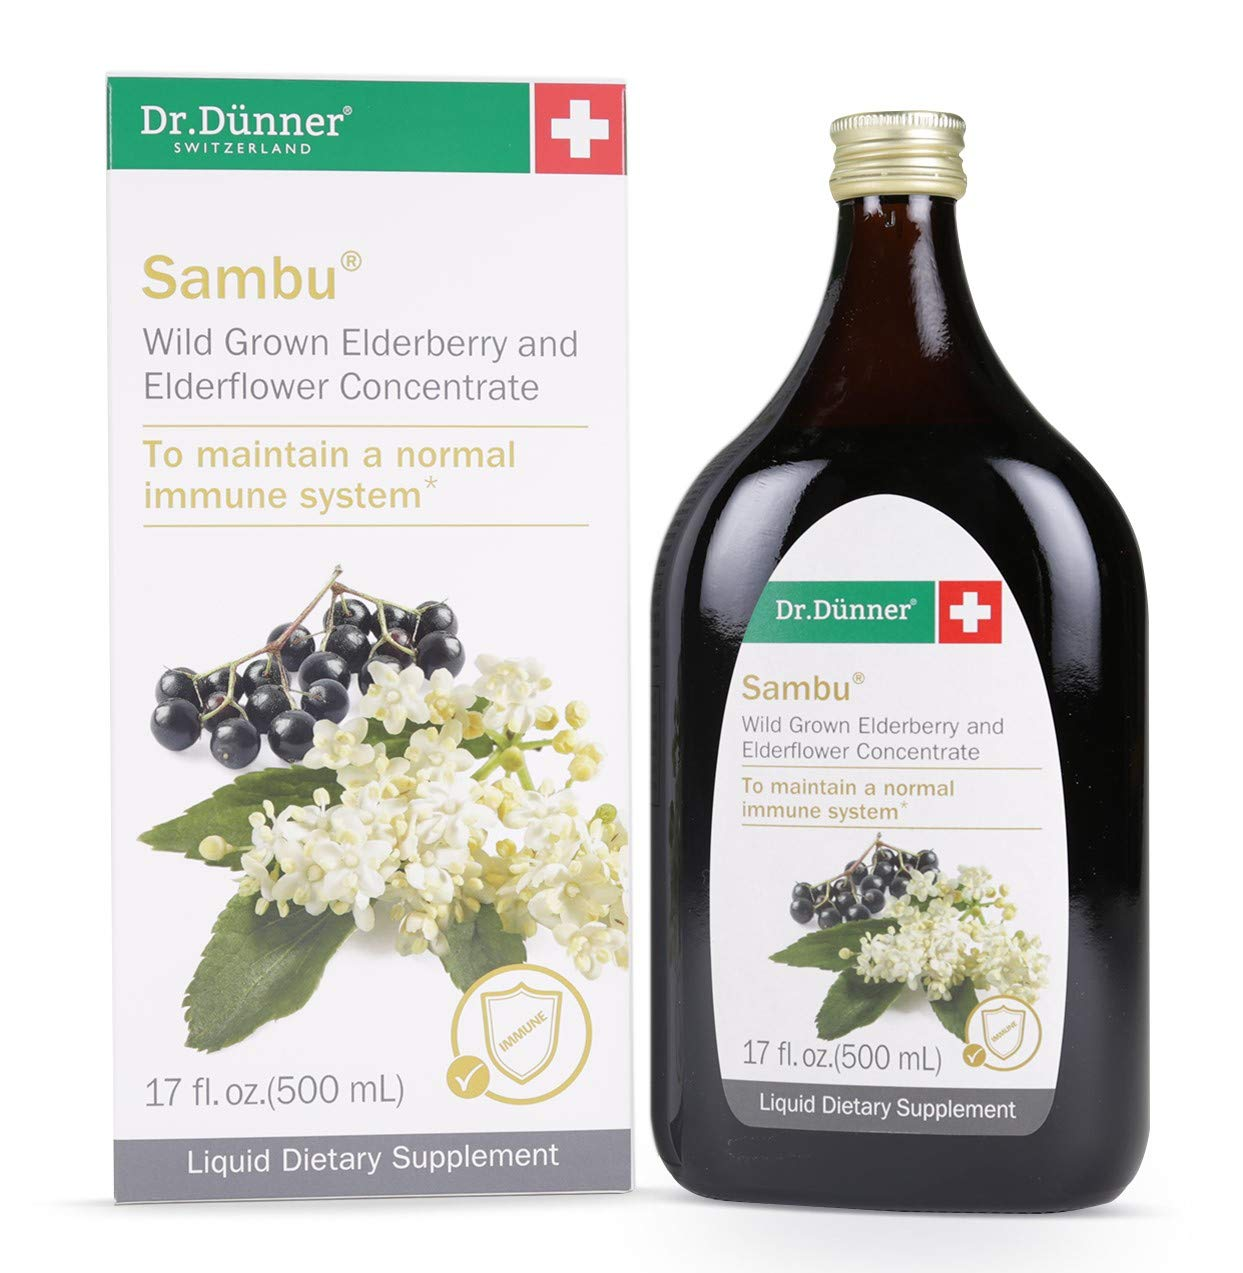 Dr. Dunner Sambu Black Elderberry Syrup, 17 fl oz, Non-GMO